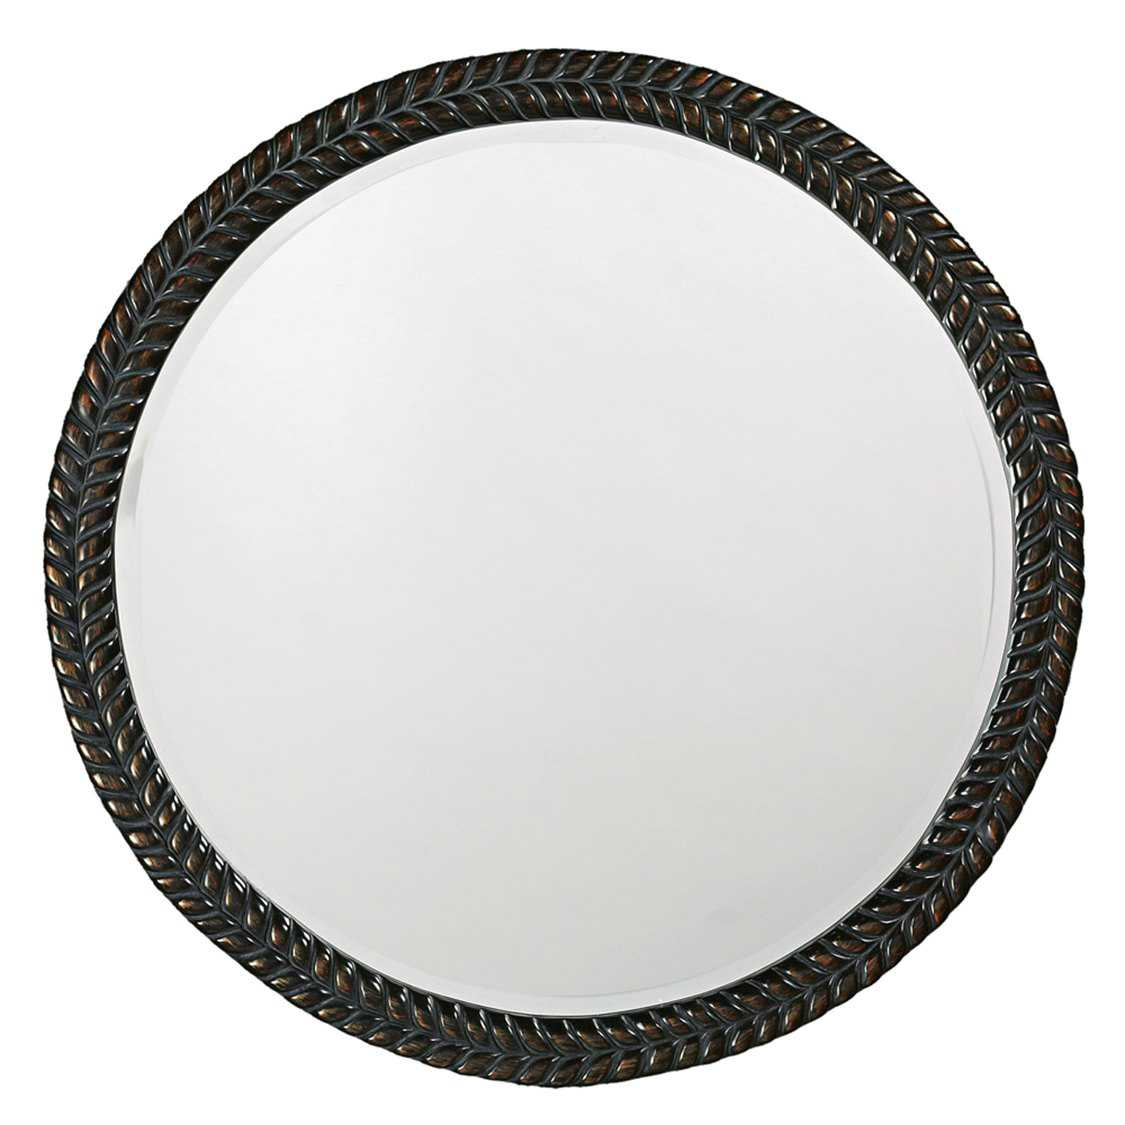 Howard elliott amelia 32 round black wall mirror he5128 for Round black wall mirror